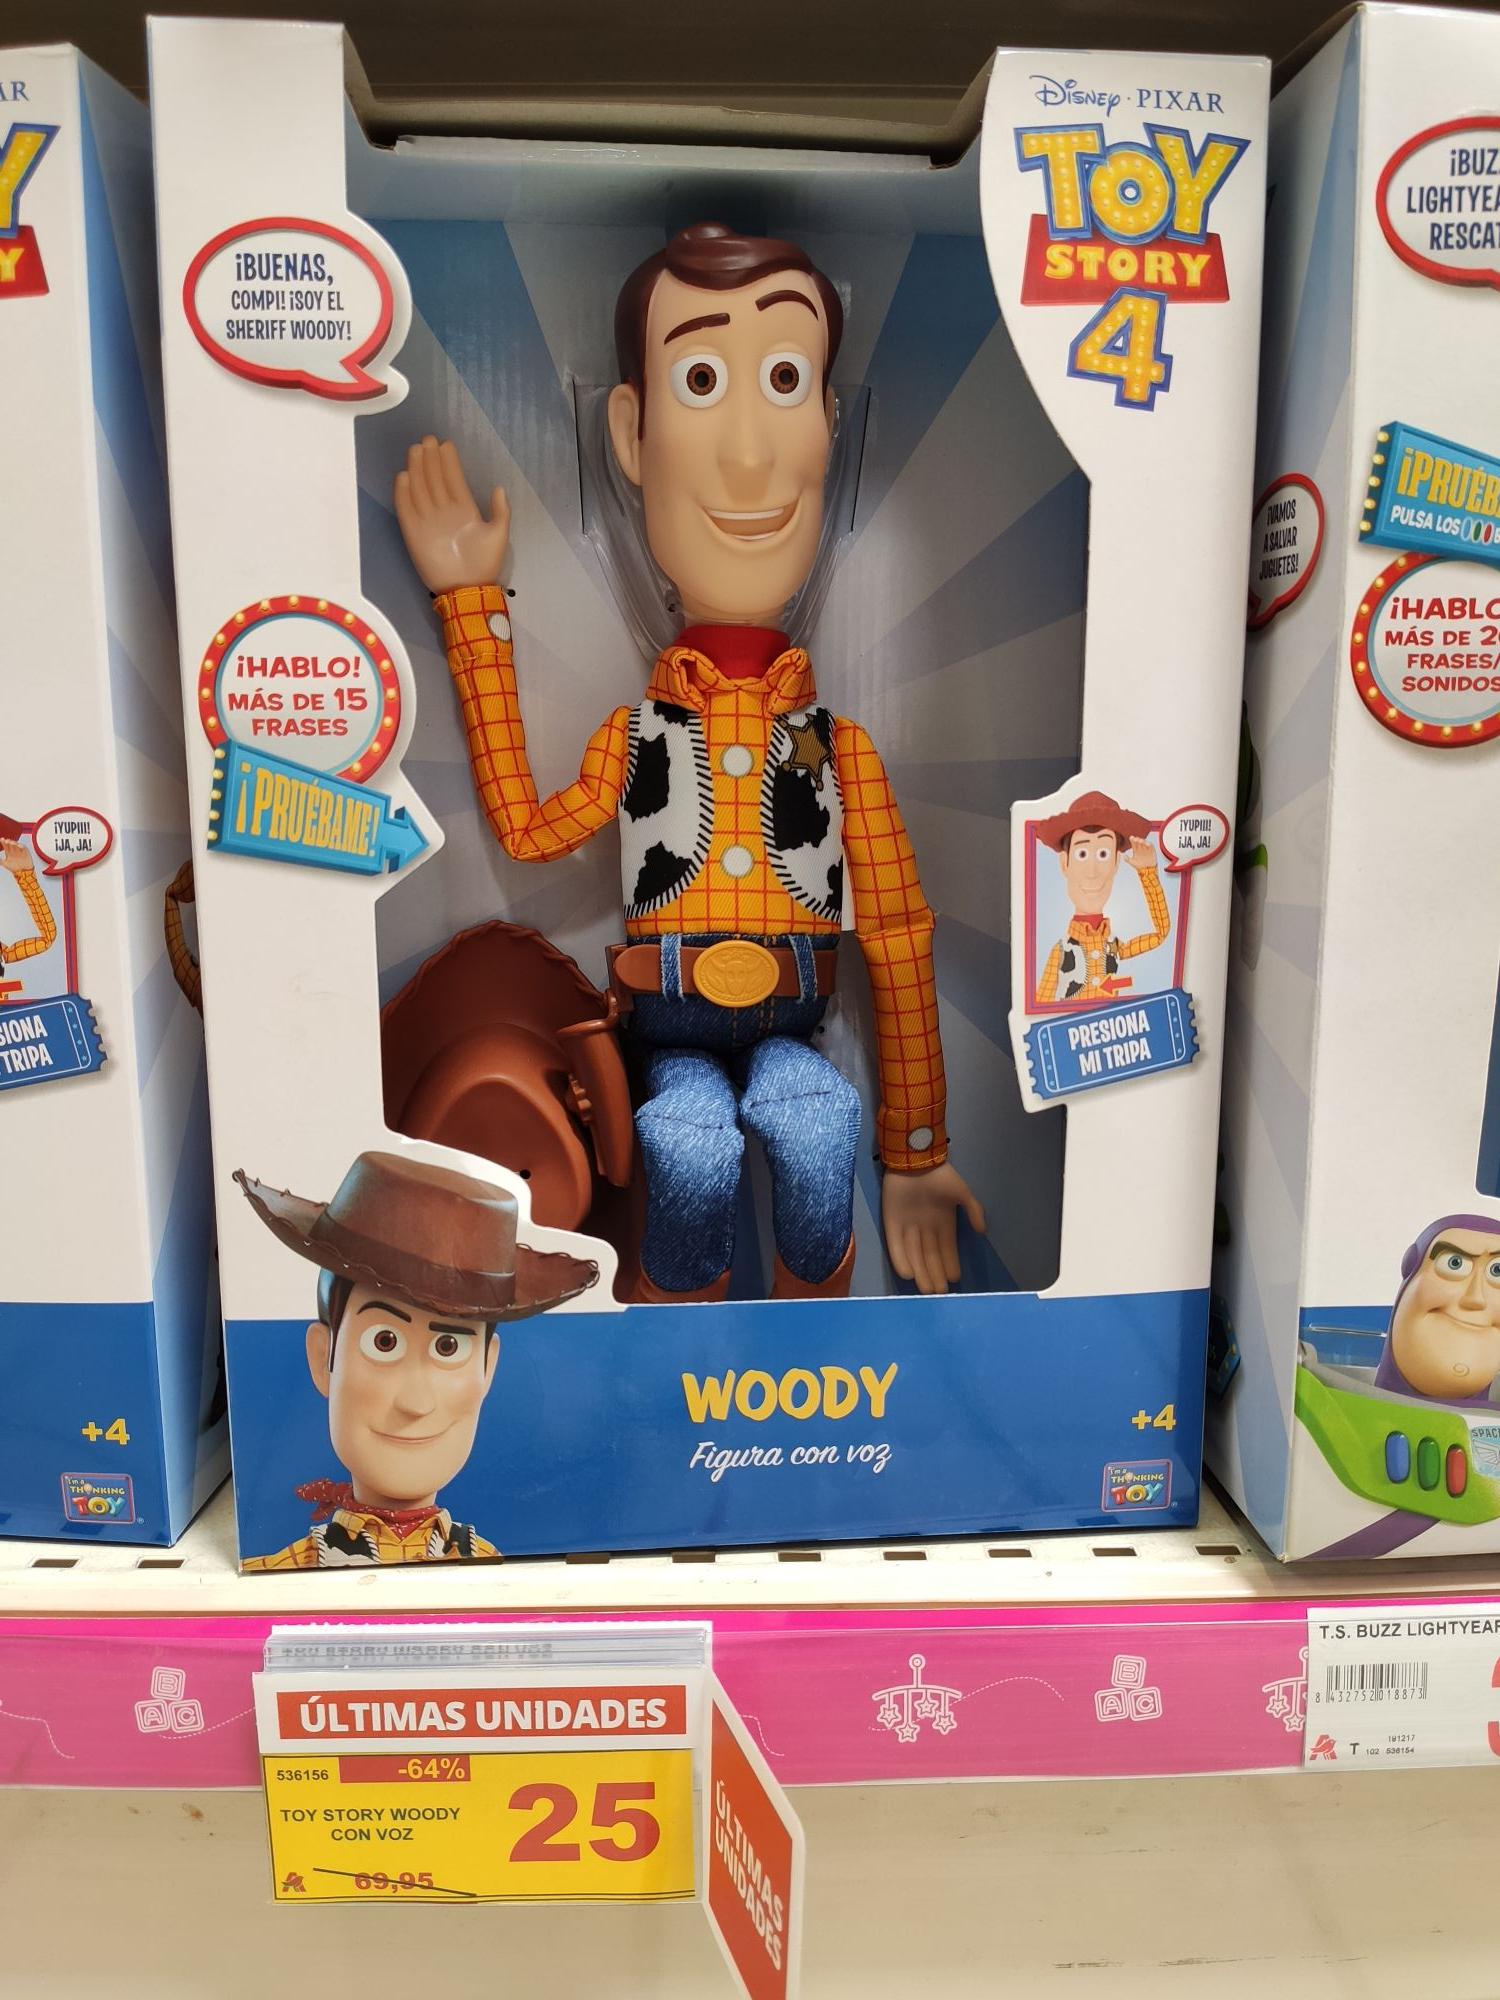 Muñeco Woody con voz Toy Story DISNEY PIXAR.